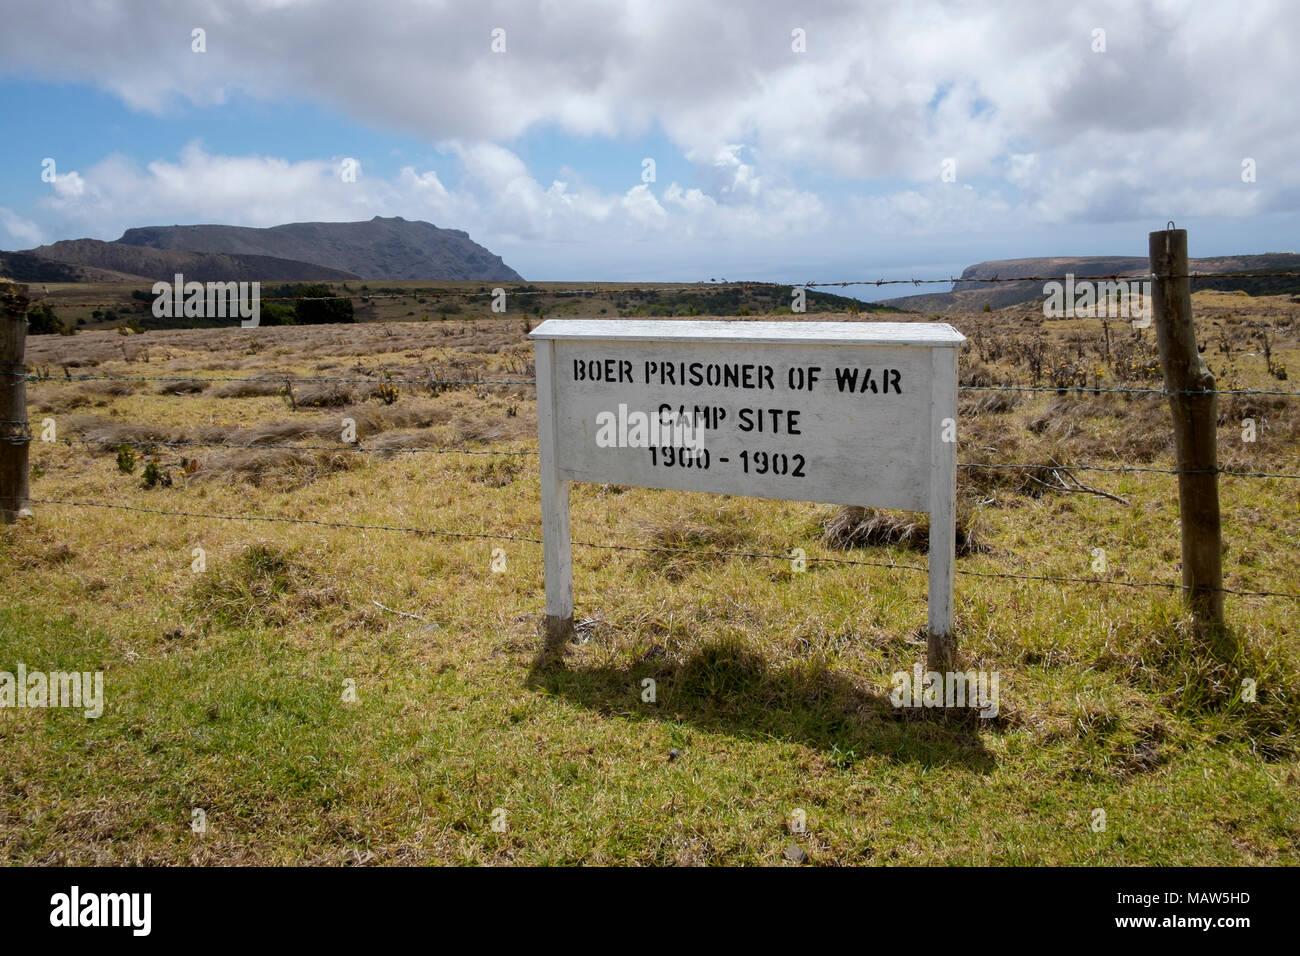 Site of Boer prisoner of war camp, Saint Helena, South Atlantic. - Stock Image